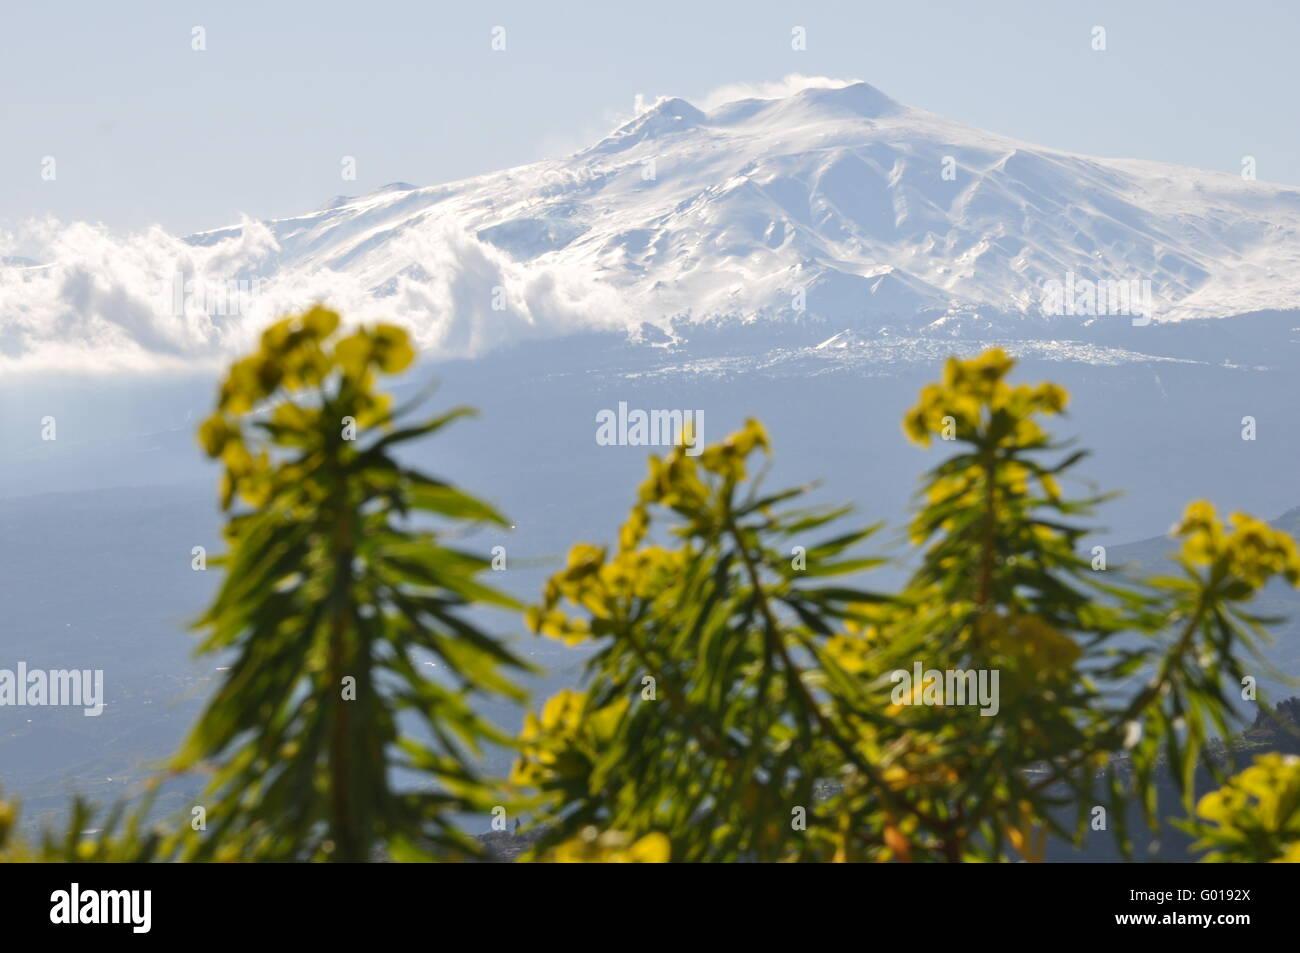 Mount Etna in Sicily - Stock Image